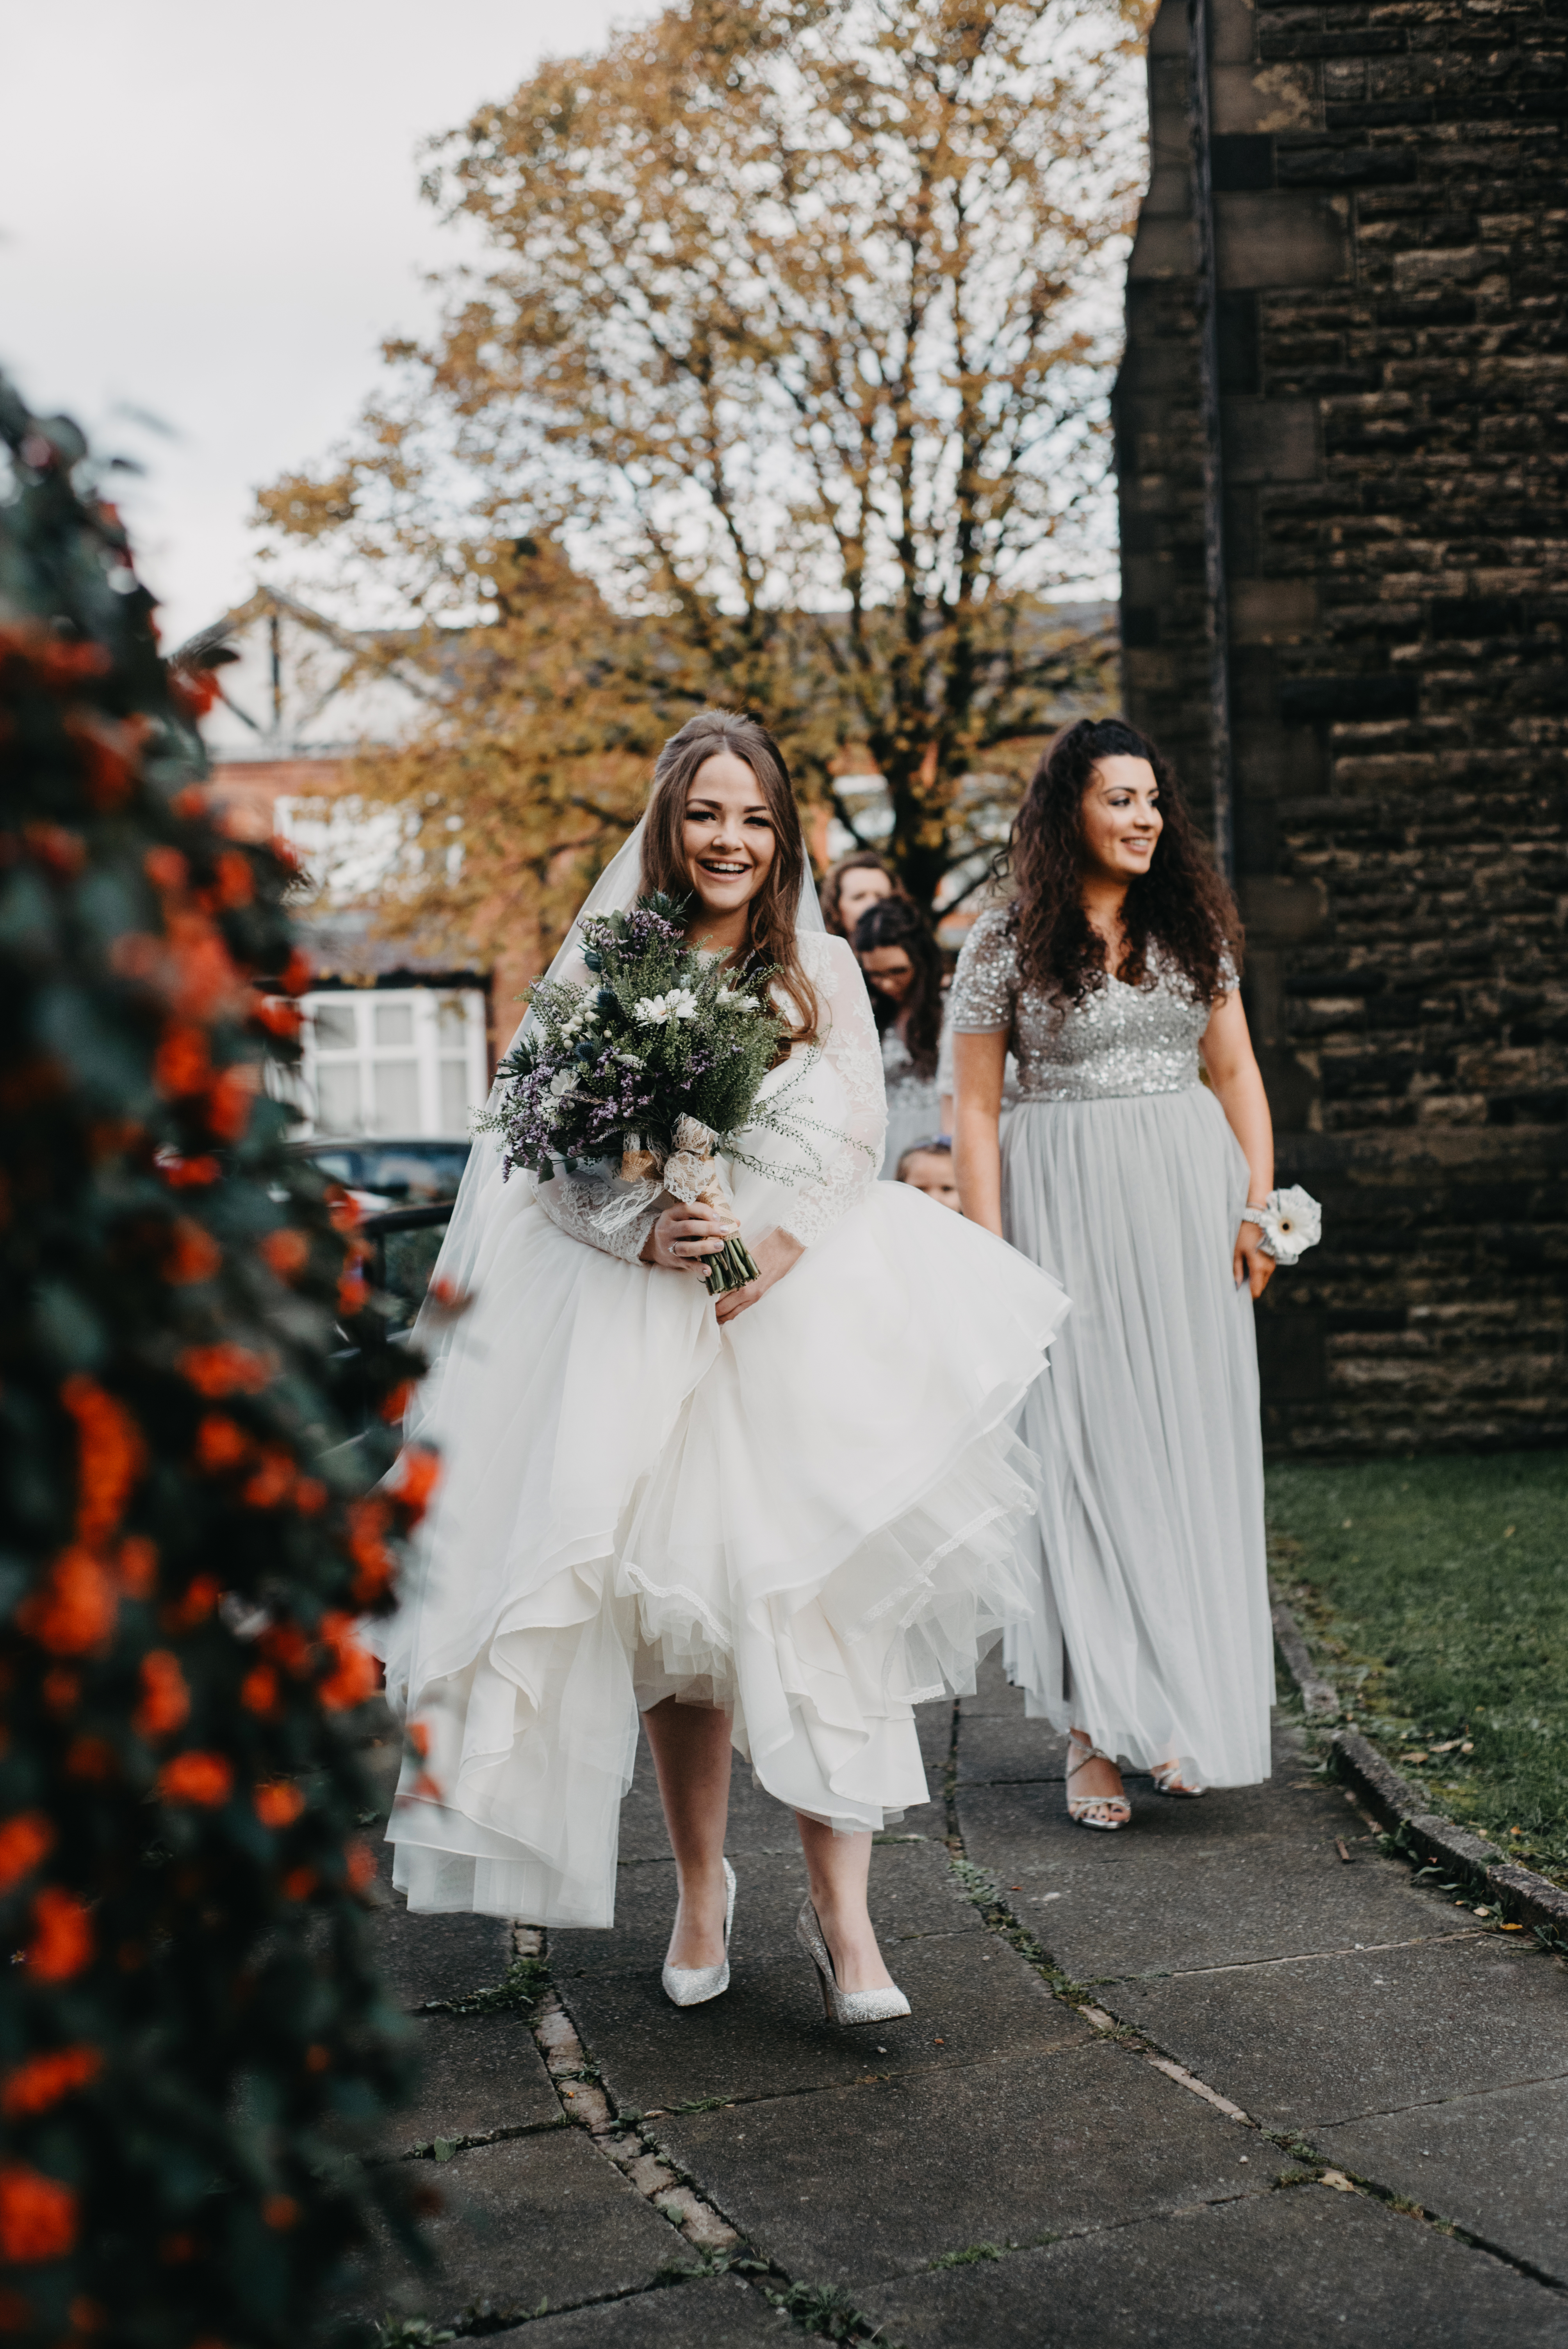 Bride walking and smiling